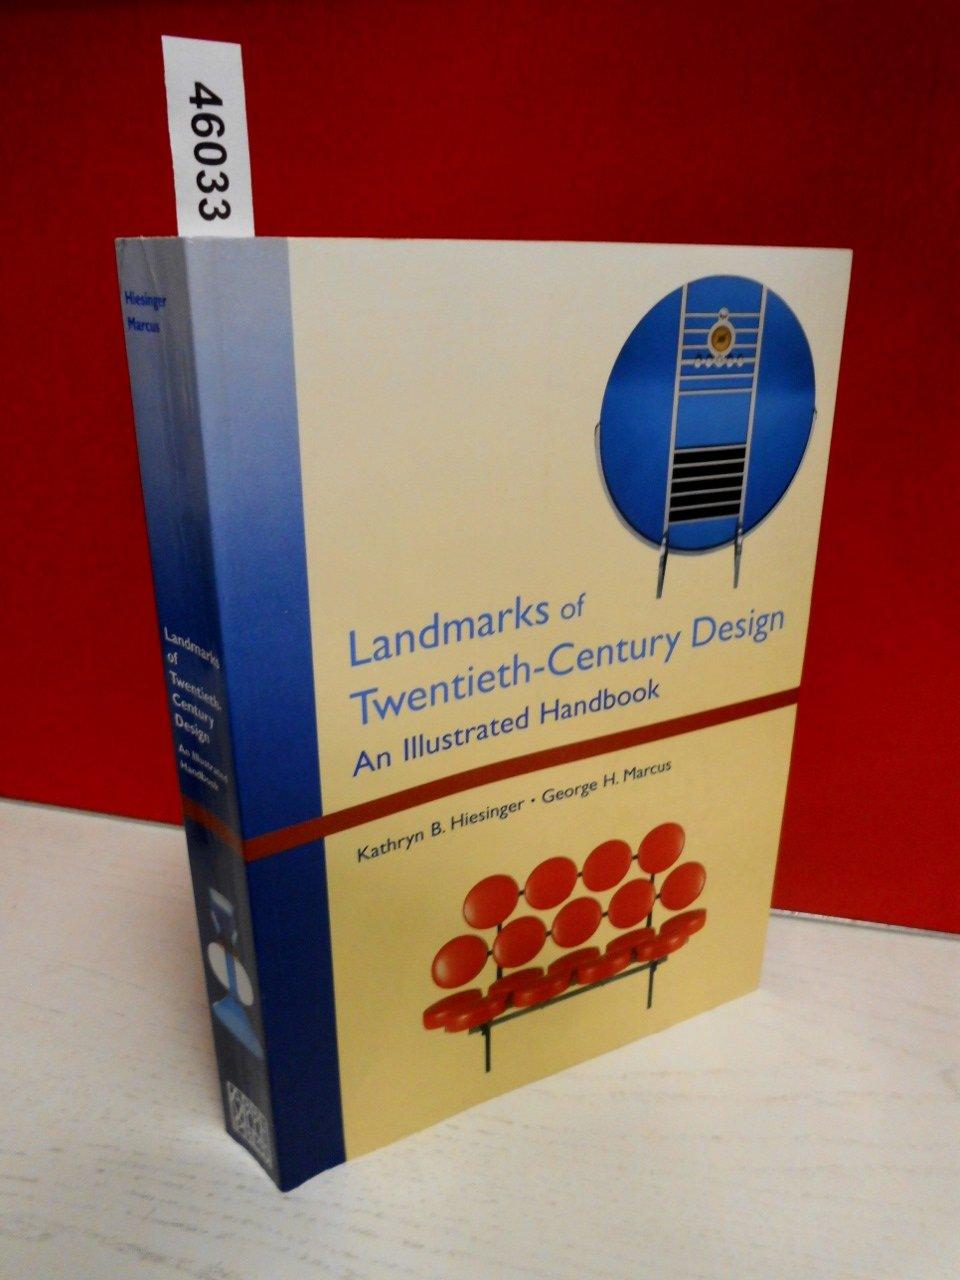 Landmarks of Twentieth-Century Design: An Illustrated Handbook